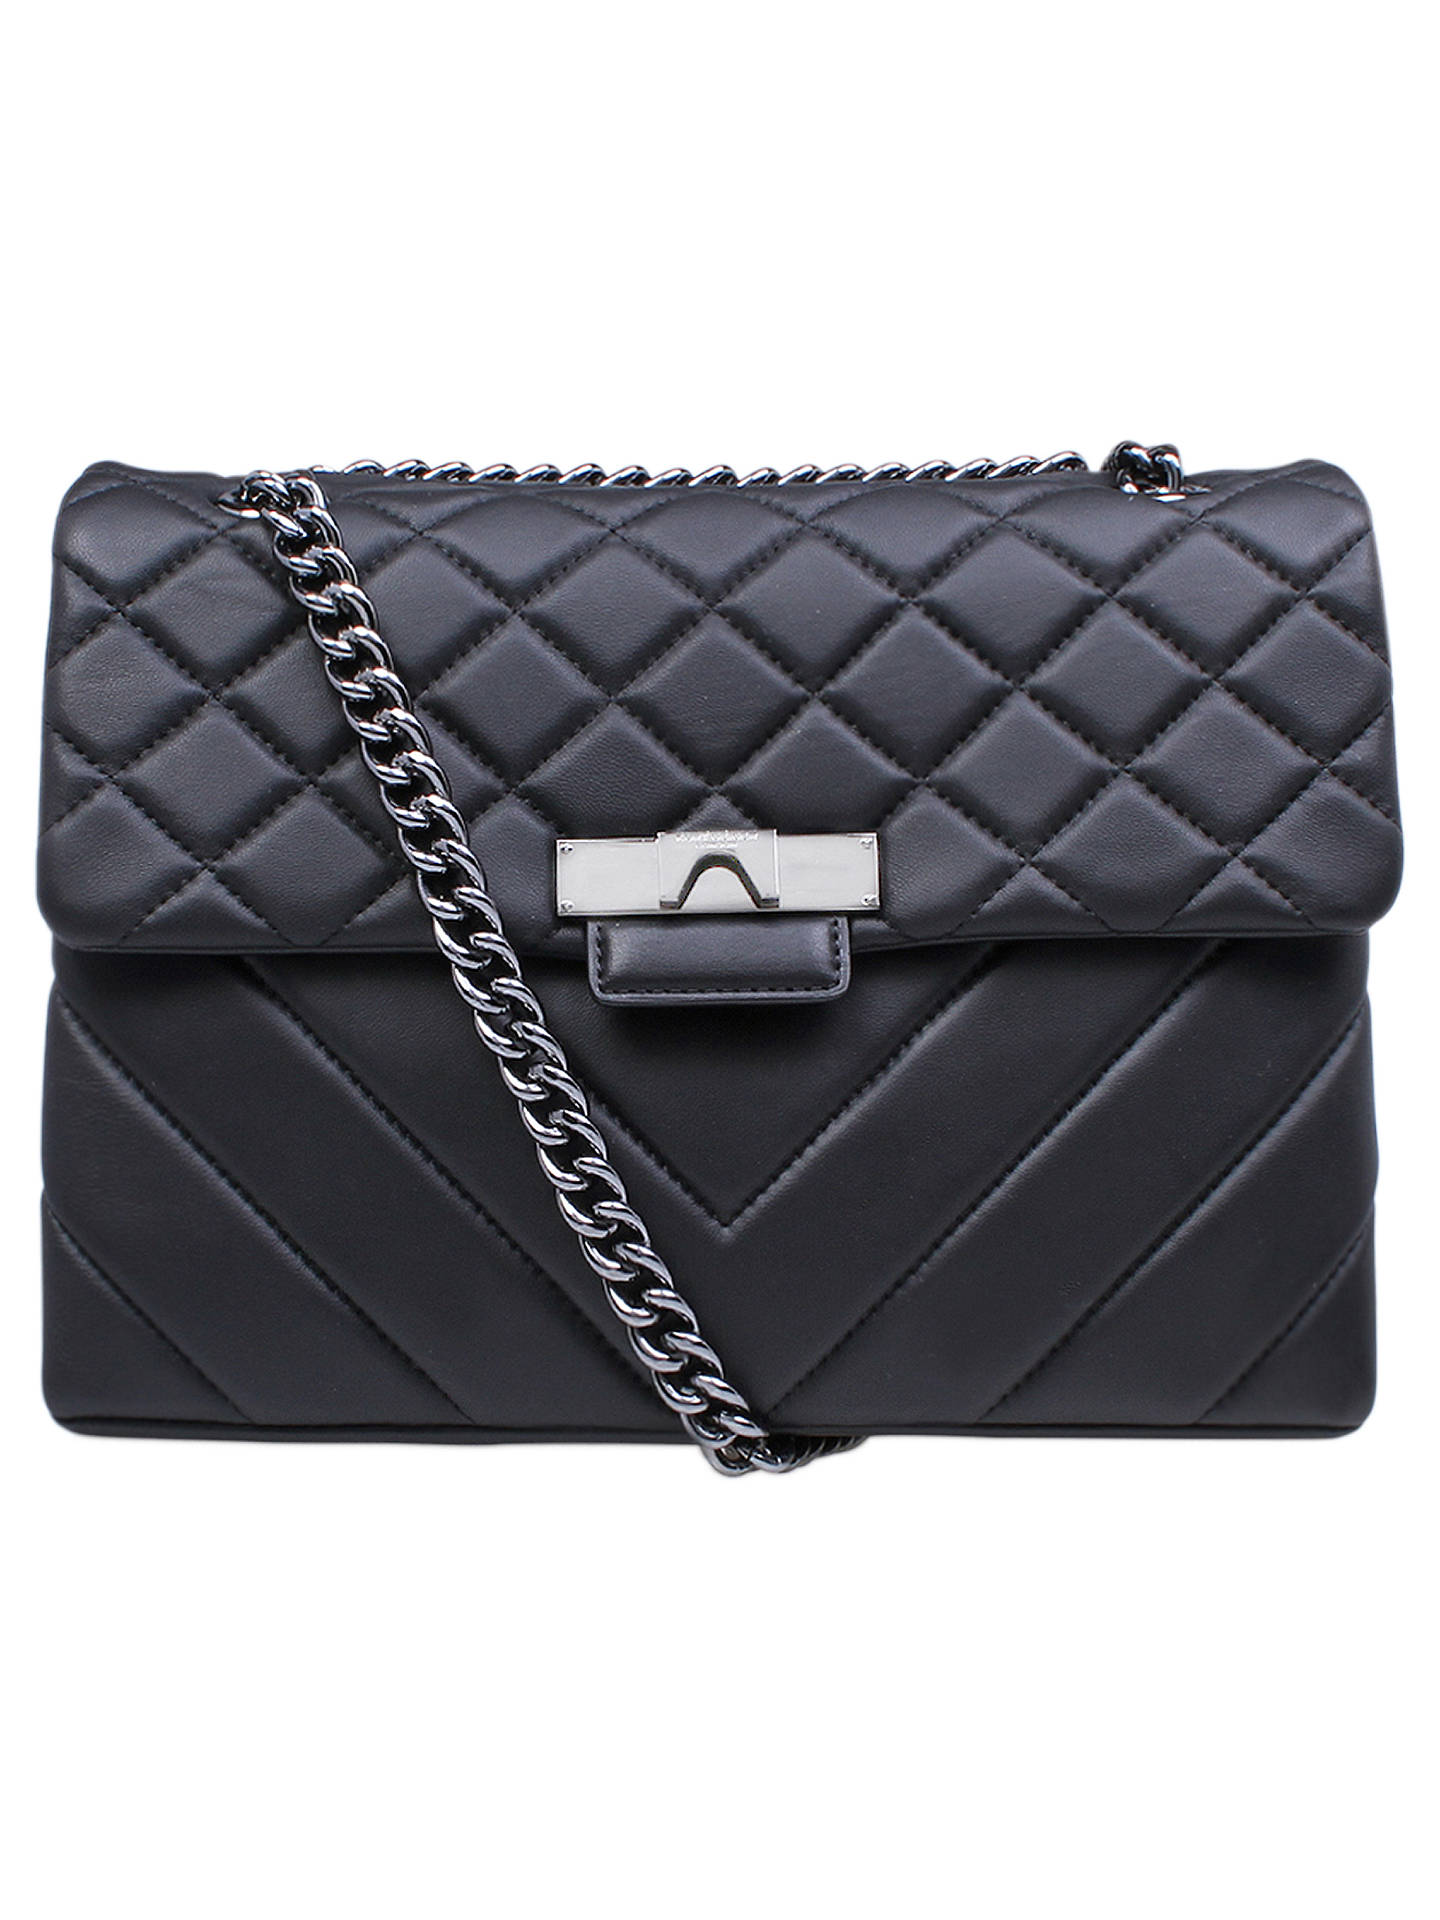 e93993789d3 Buy Kurt Geiger London Kensington Leather Large Cross Body Bag,  Black/Silver Online at ...